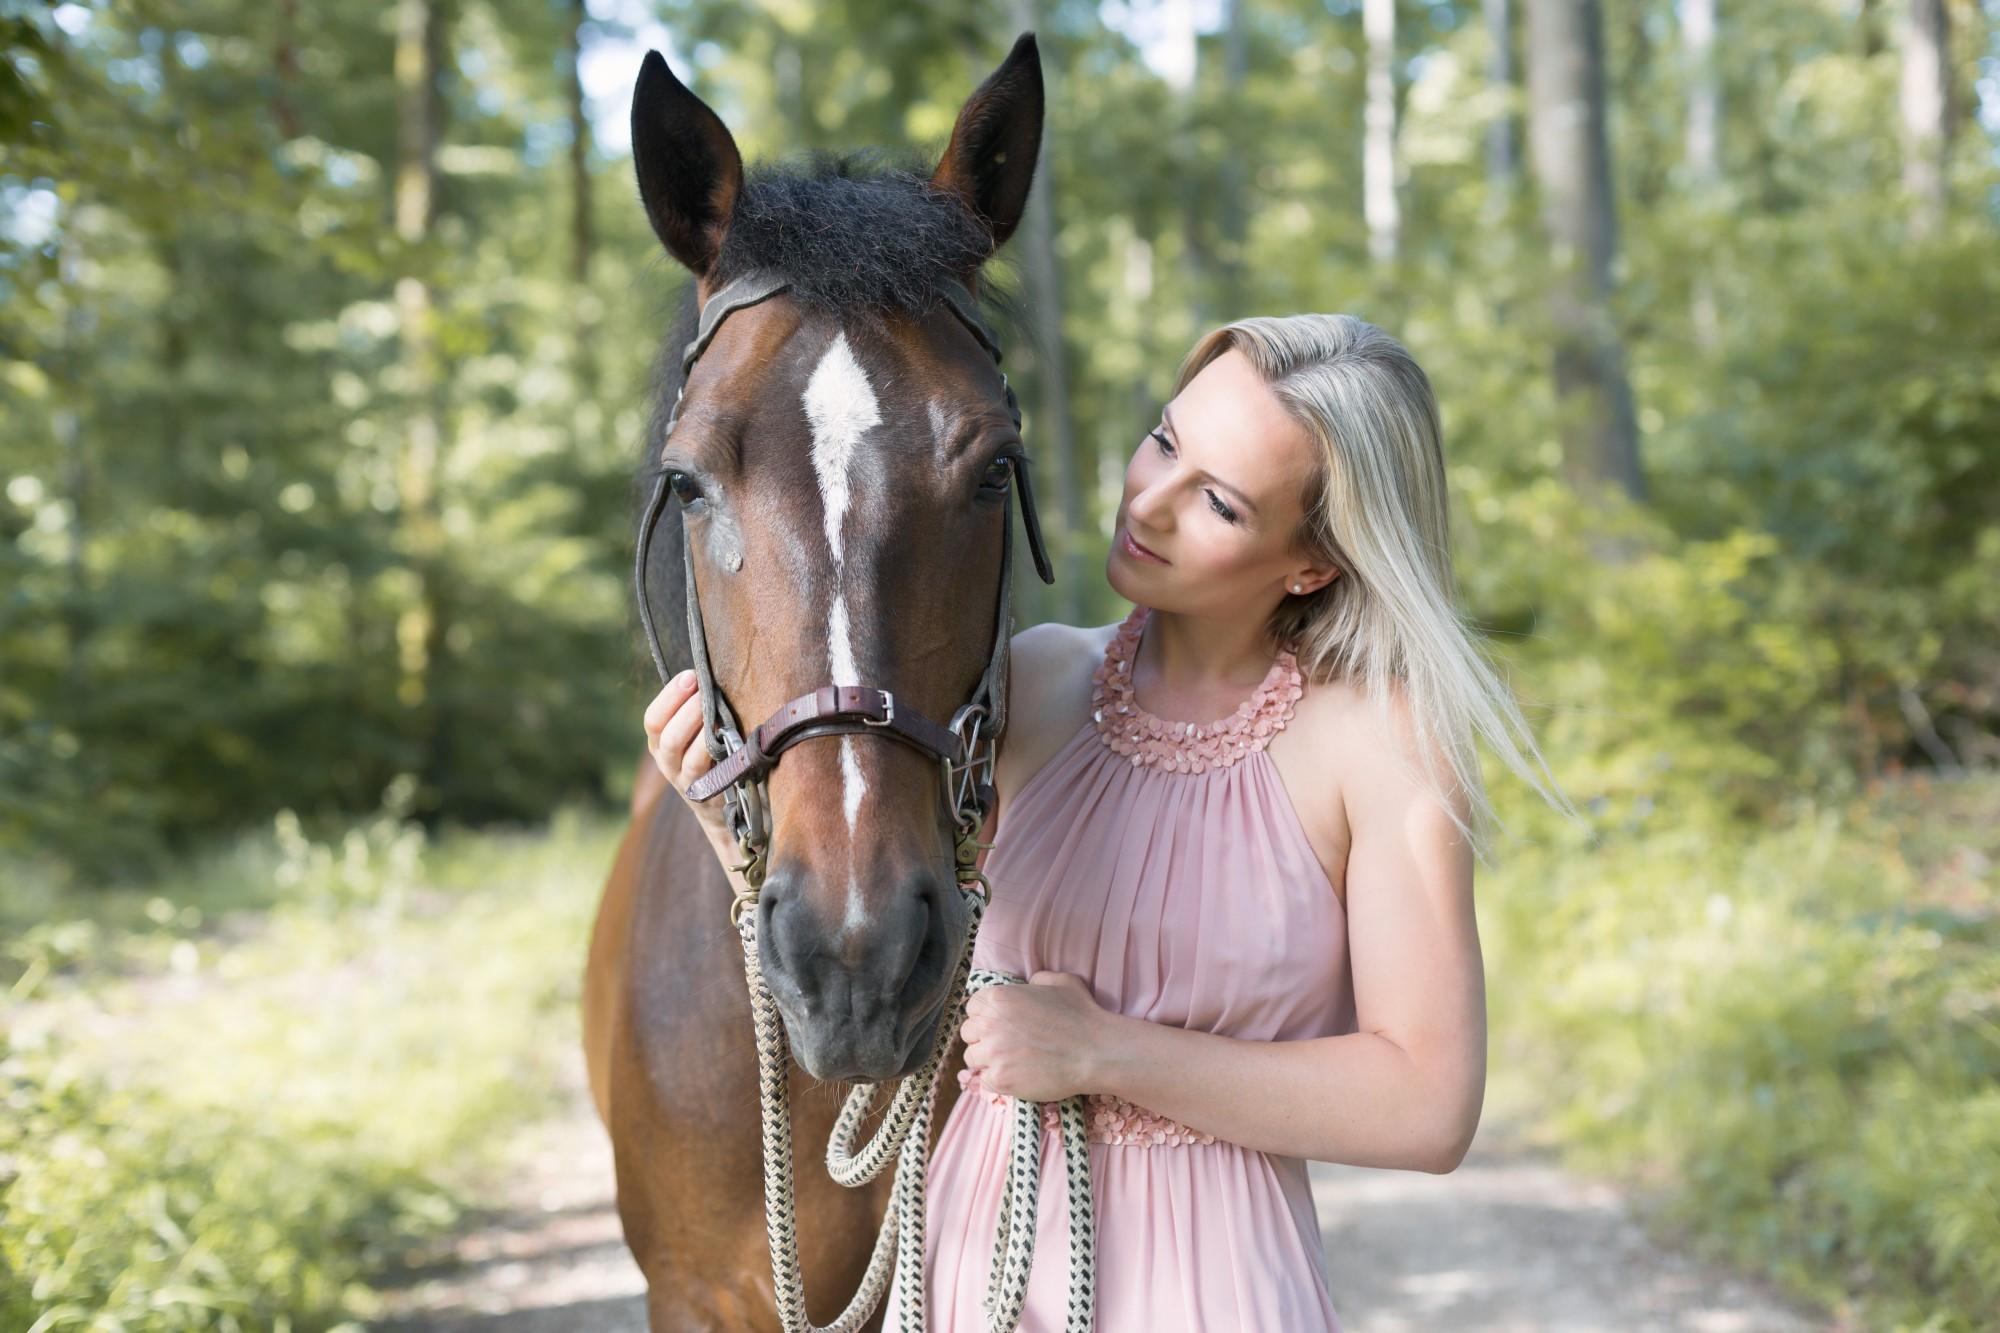 Cynthia mit ihrem Pferd Lotti beim Fotoshooting